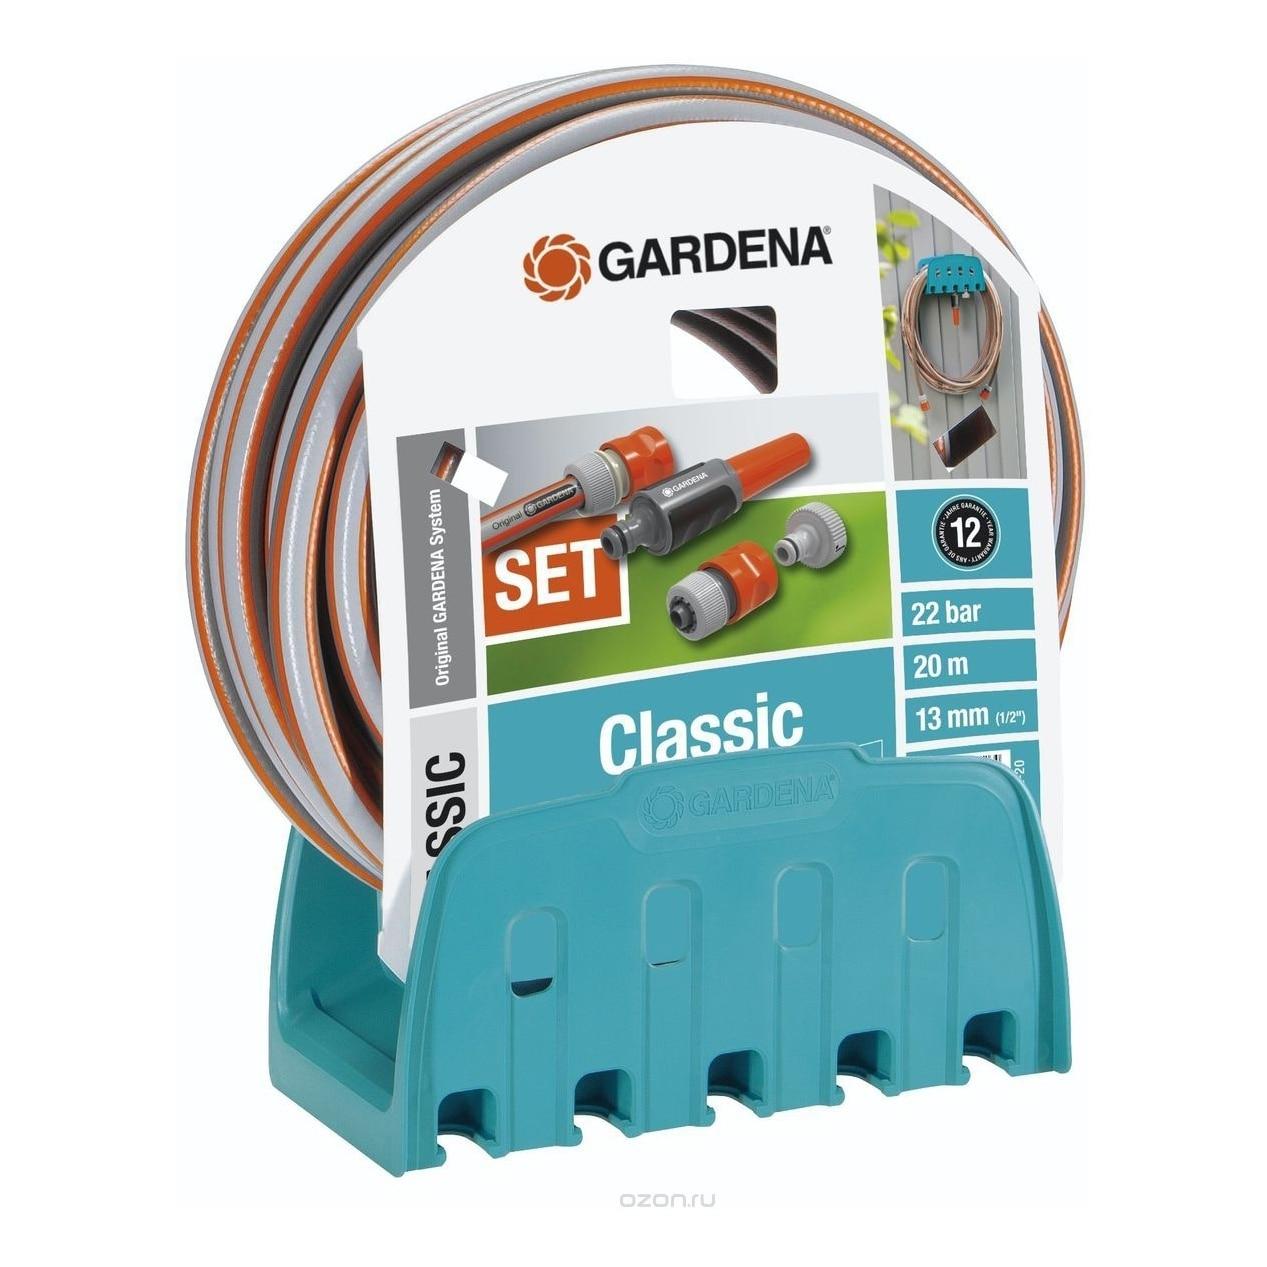 Watering set GARDENA 18005-20.000.00 кронштейн настенный со шлангом gardena classic 18005 20